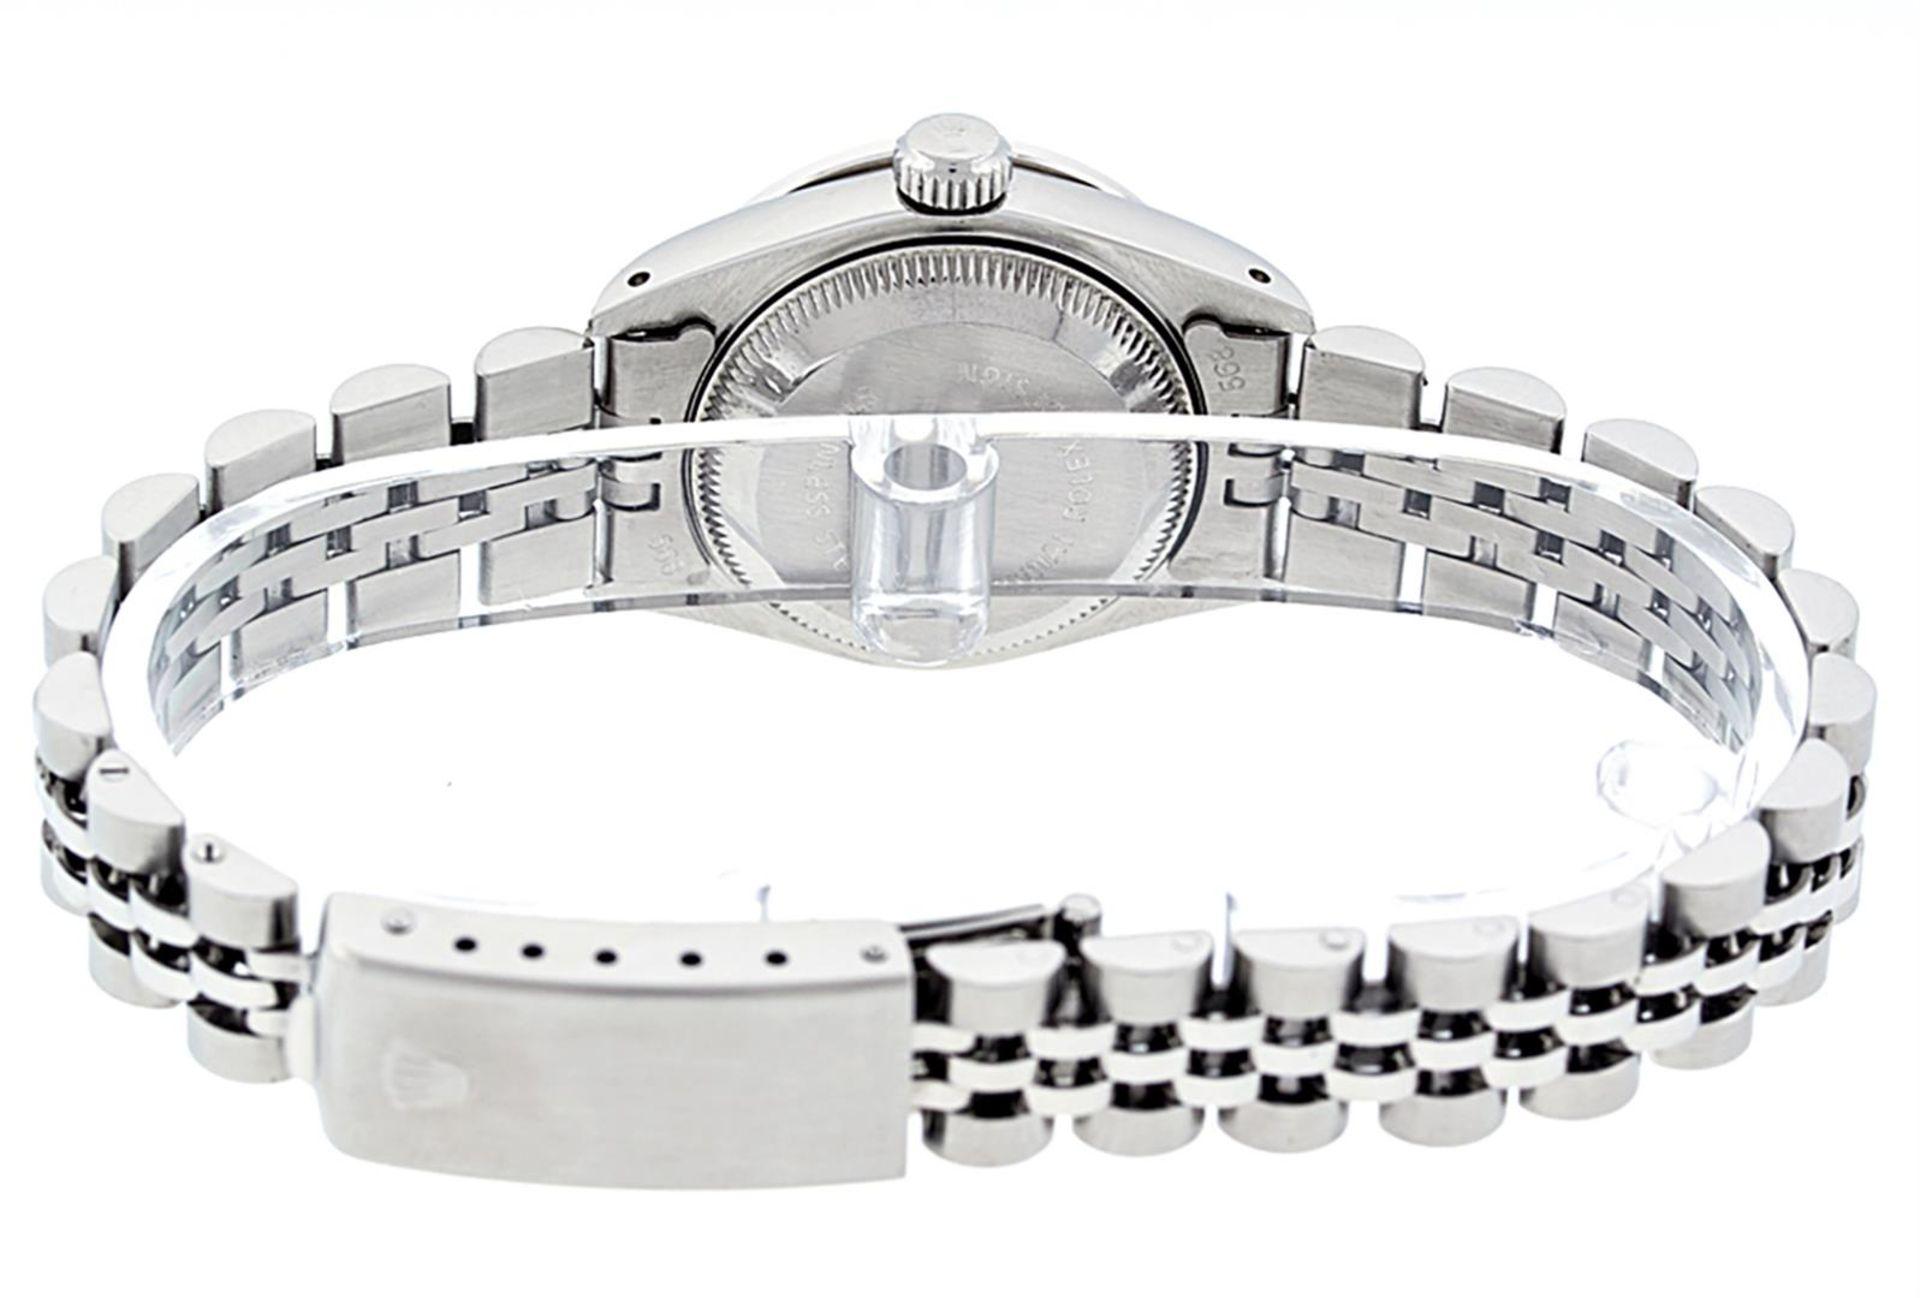 Rolex Ladies Stainless Steel 26MM Orange String Diamond Lugs Datejust Wristwatch - Image 7 of 9